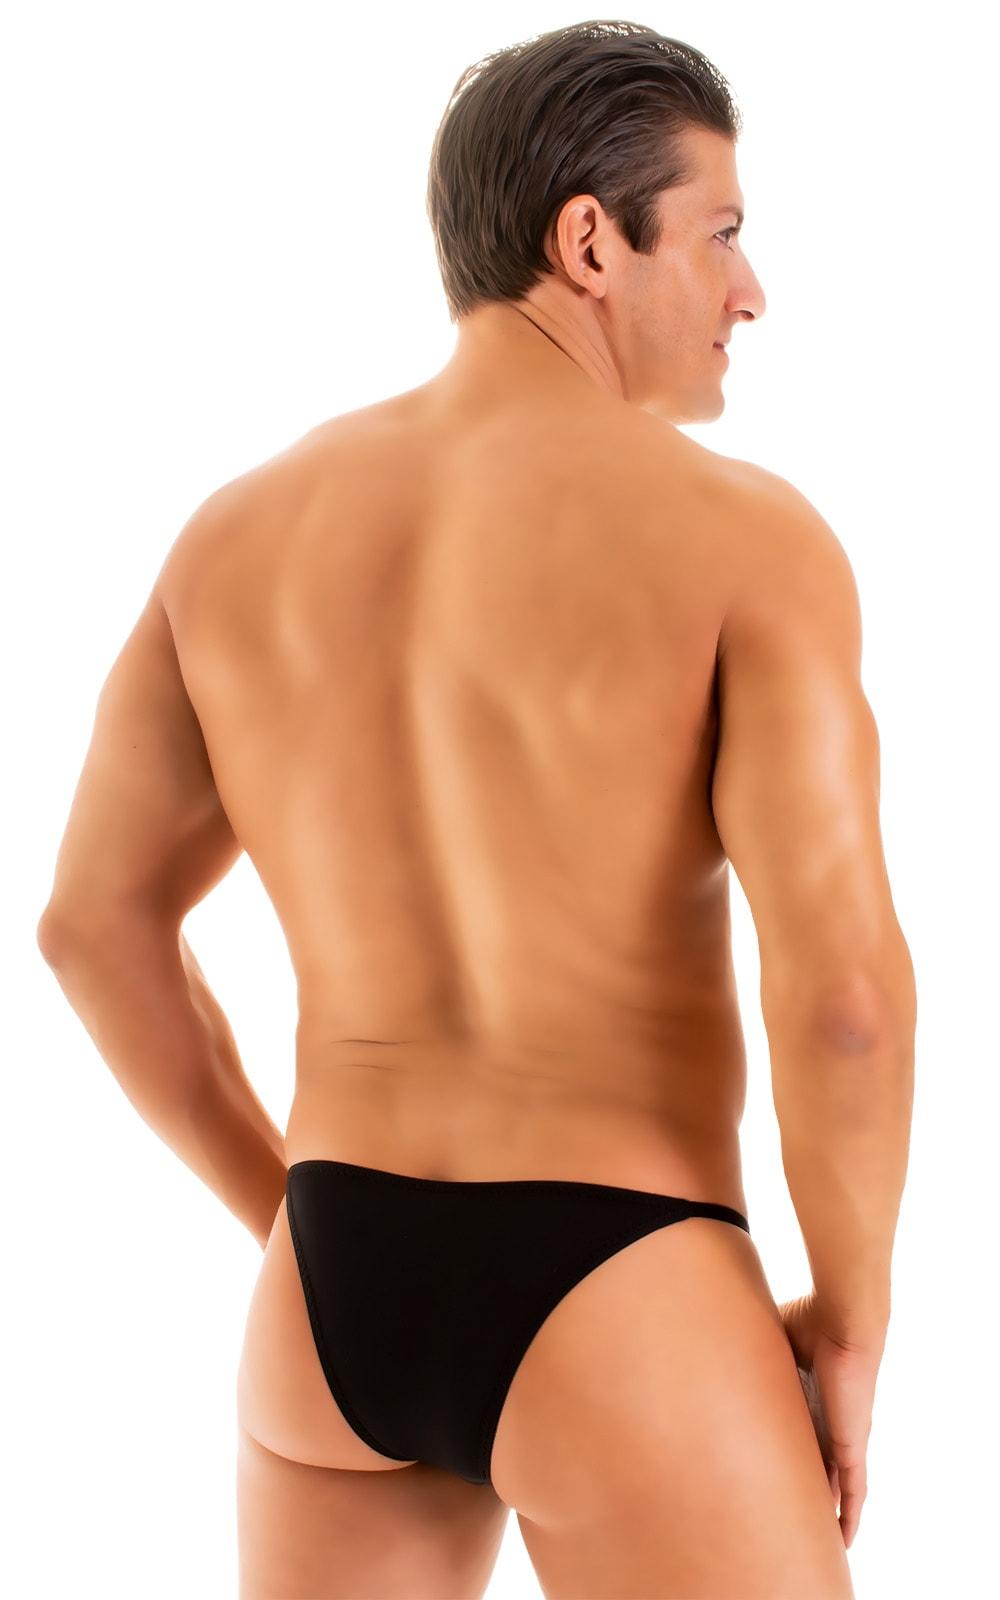 Super Low Brazilian Bikini in Super ThinSKINZ Black 3